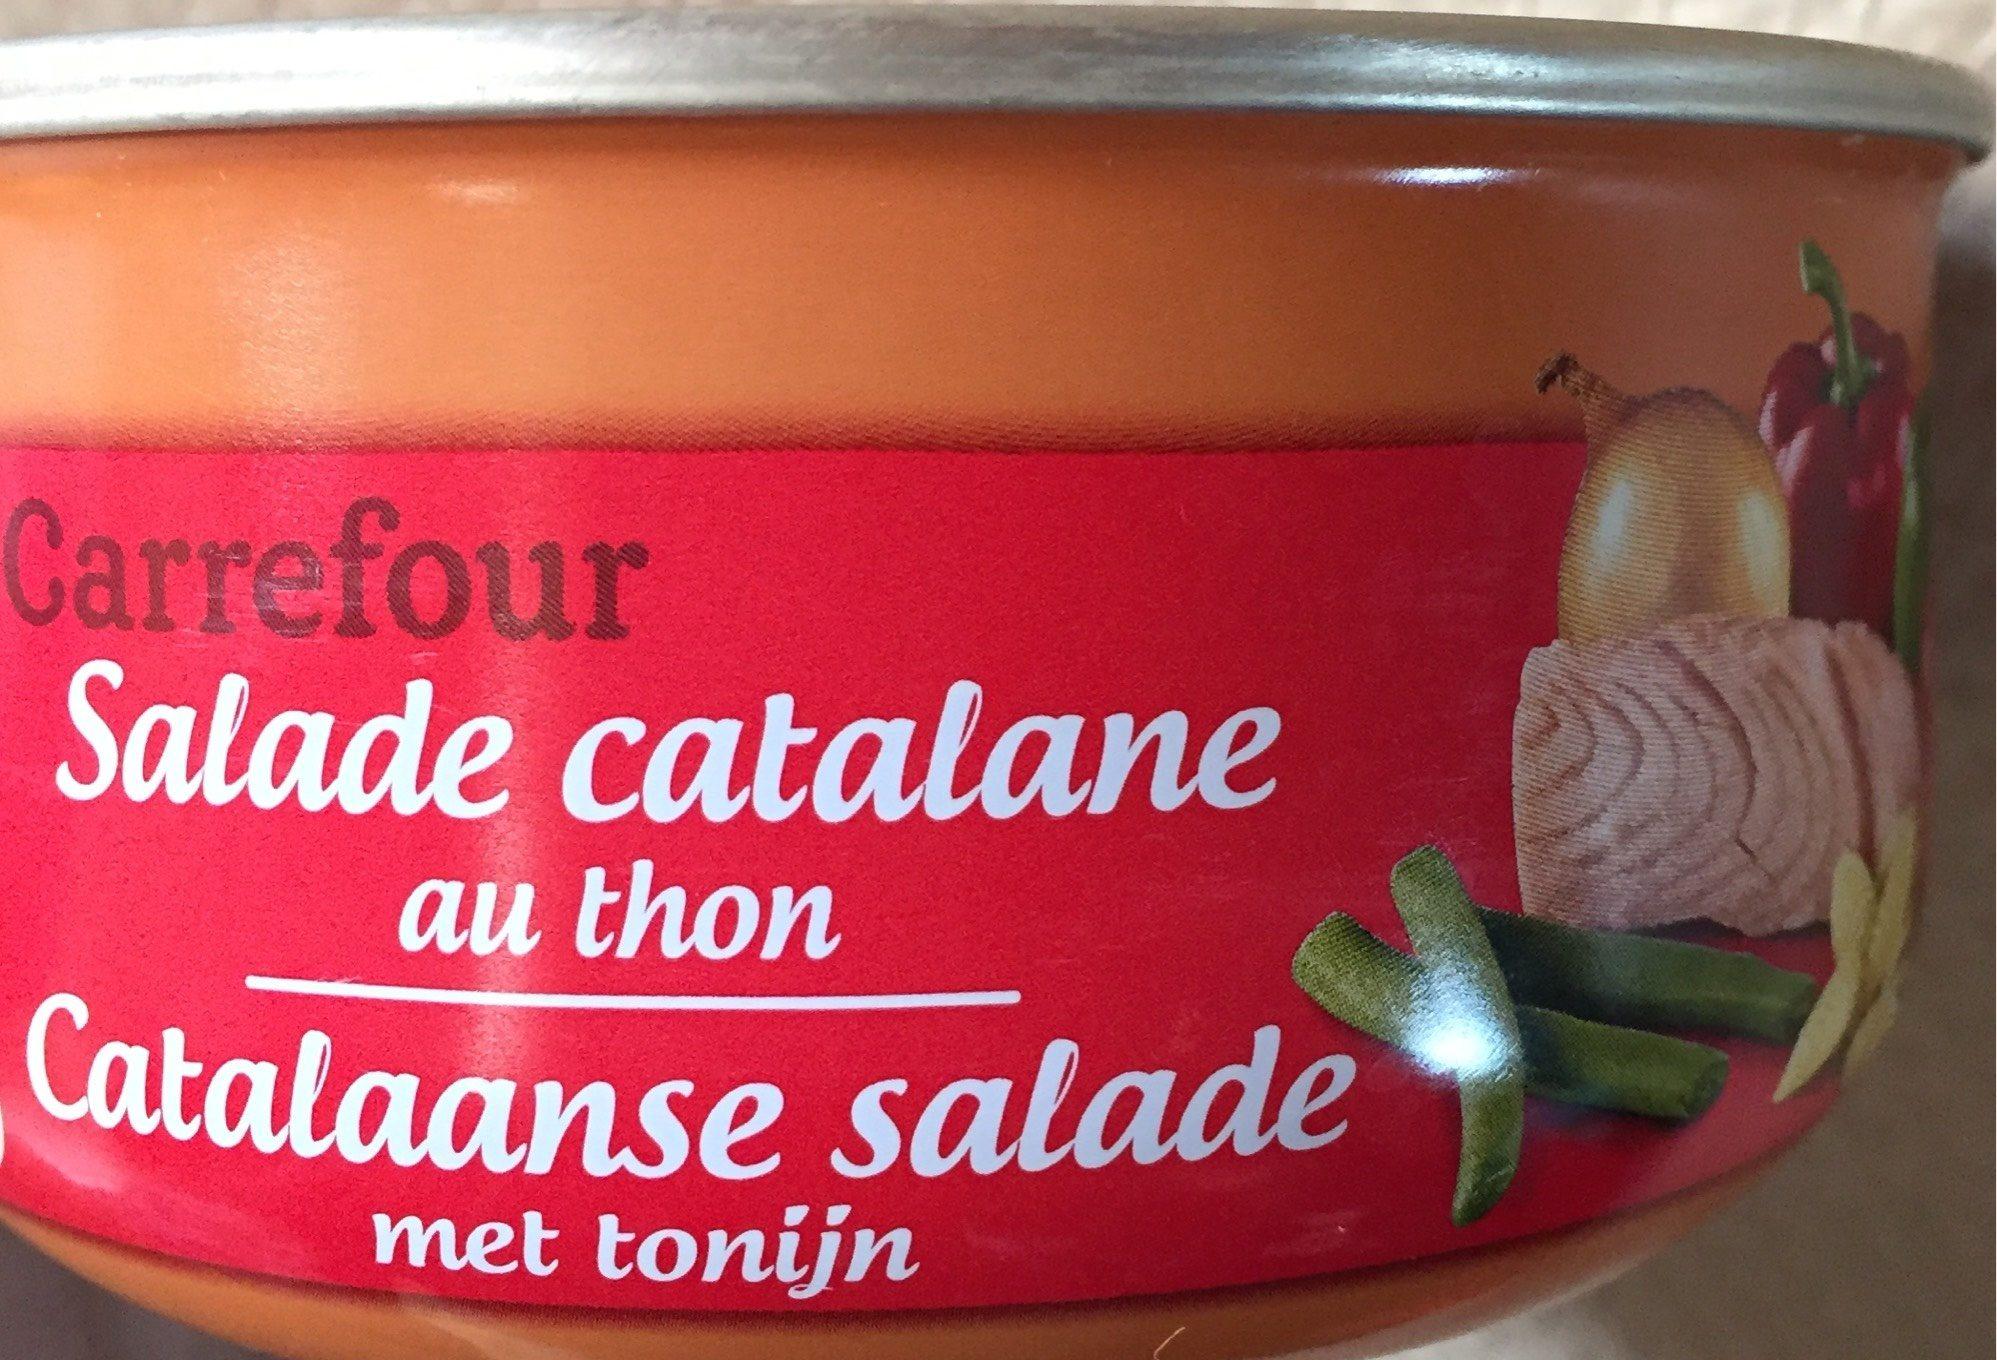 Salade au thon Catalane - Produit